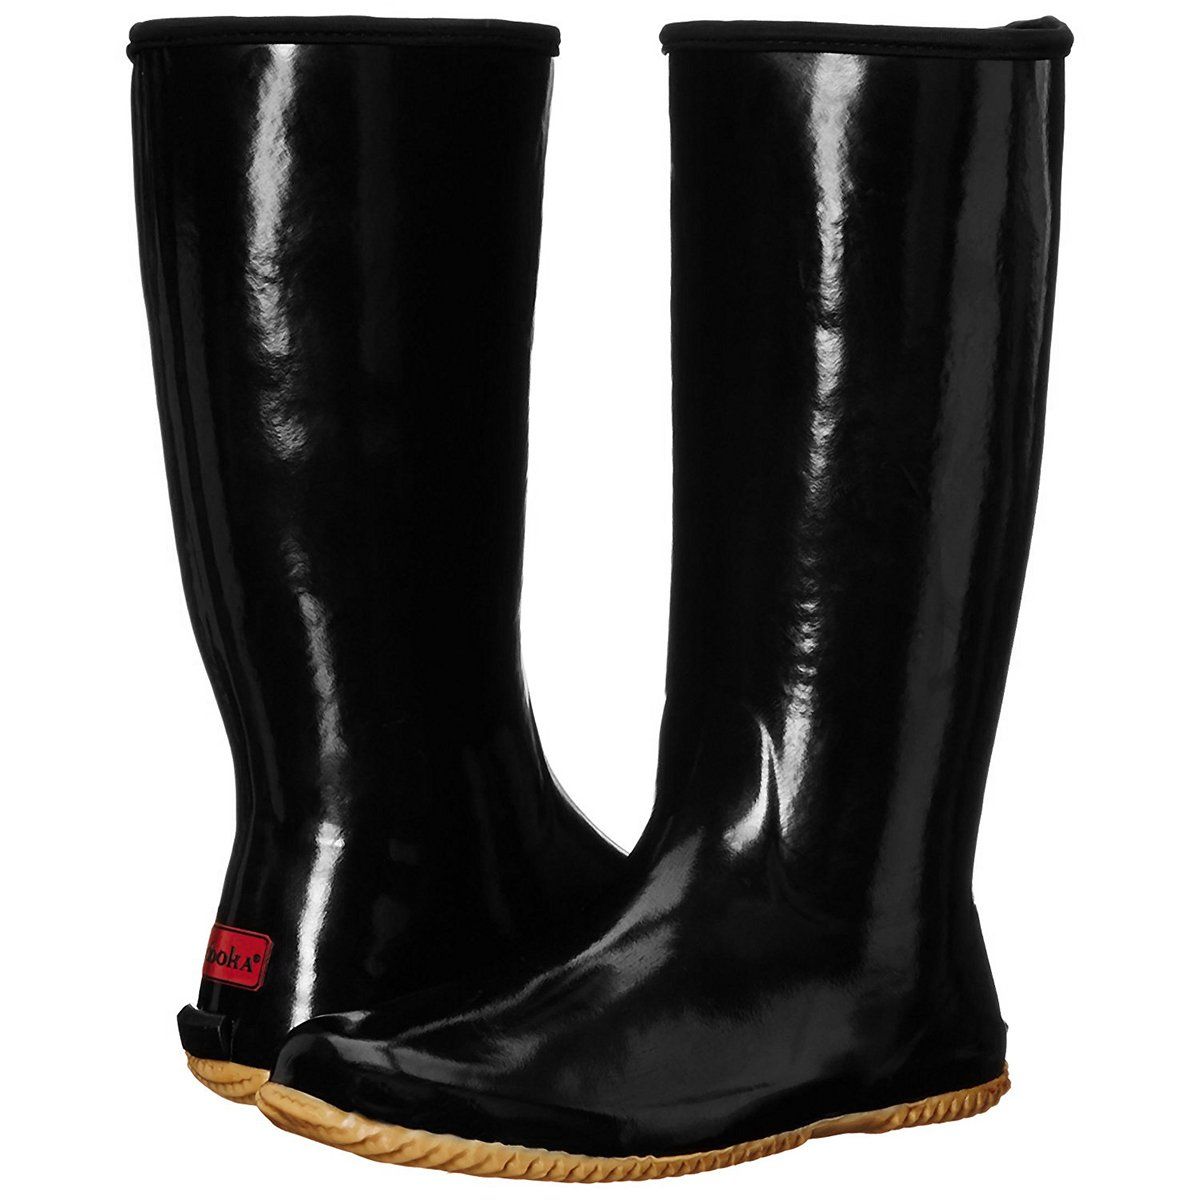 fc930a132f0 Chooka Women's Packable Rain Boot